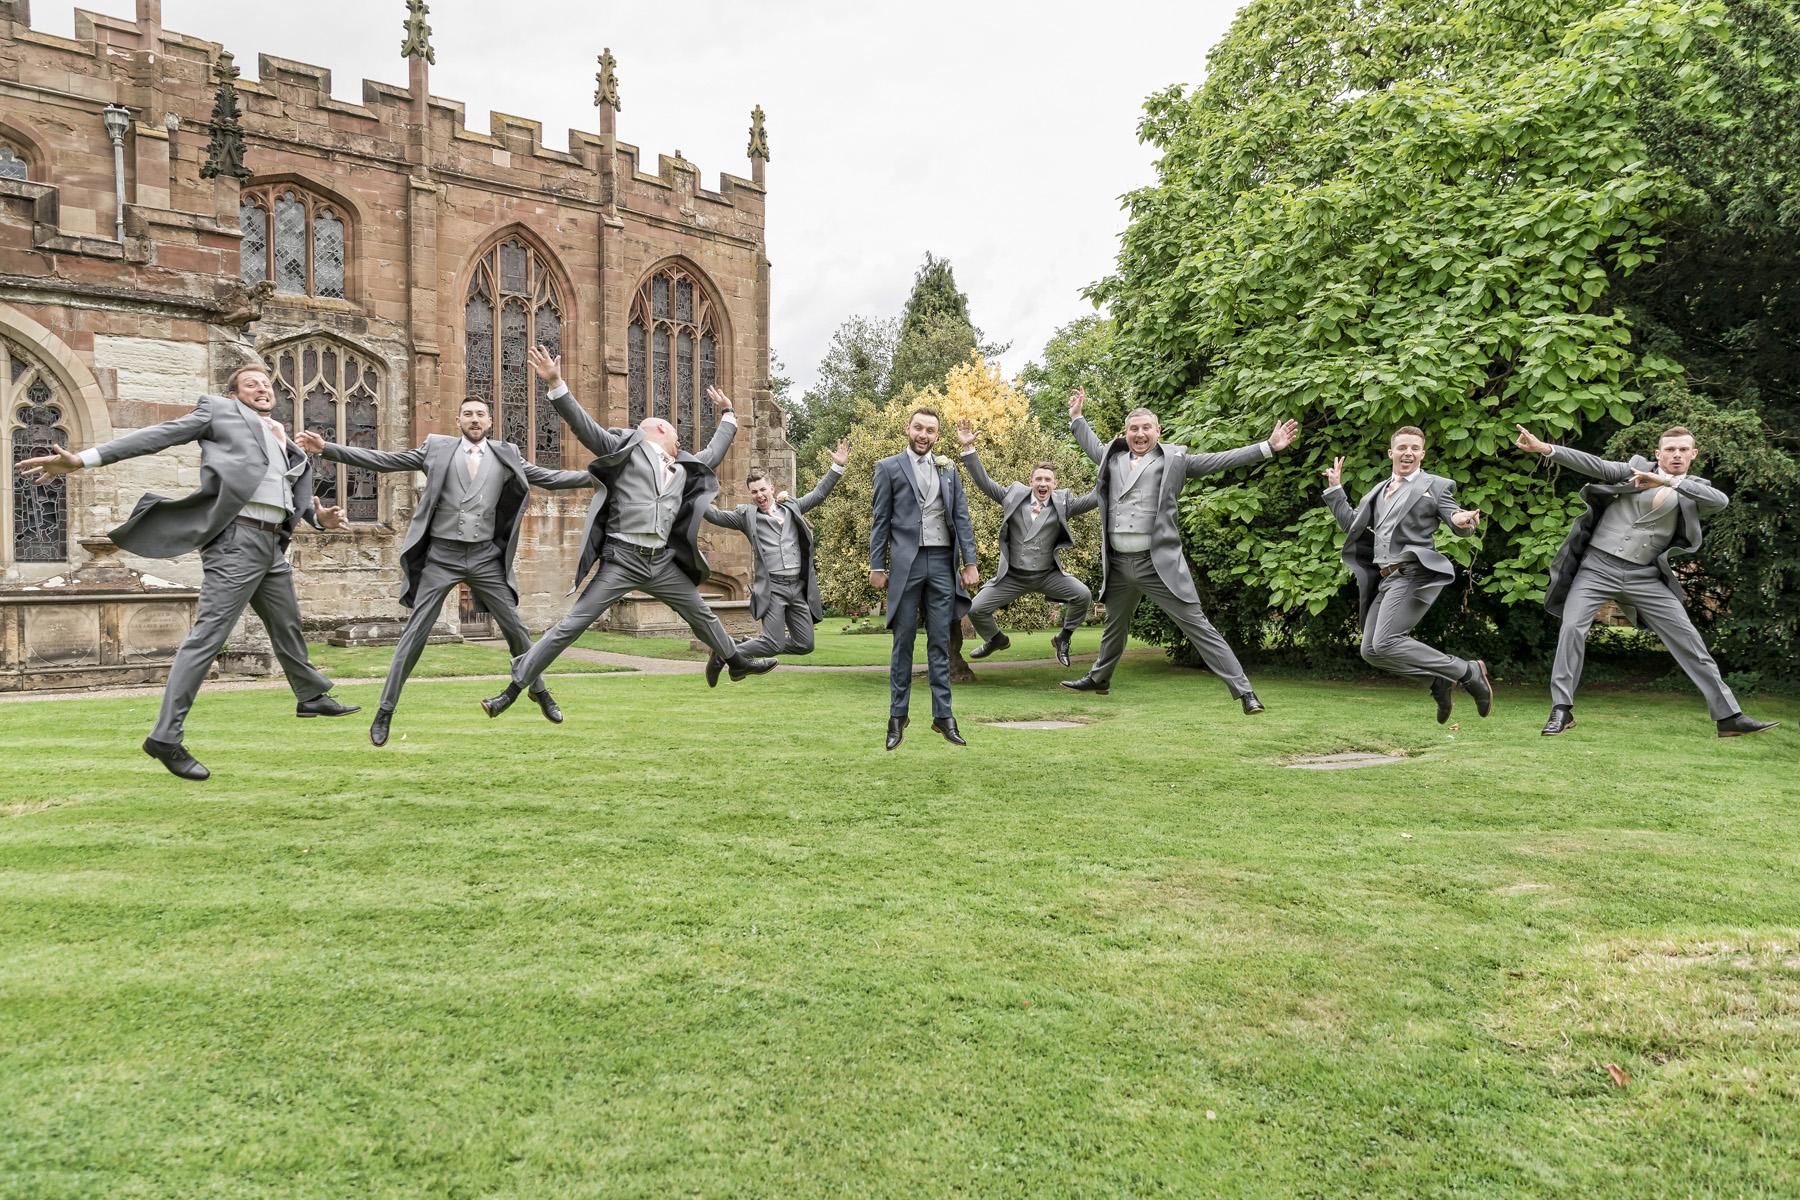 Groom & Grooms-men fun star jump photo before wedding at Knowle Church